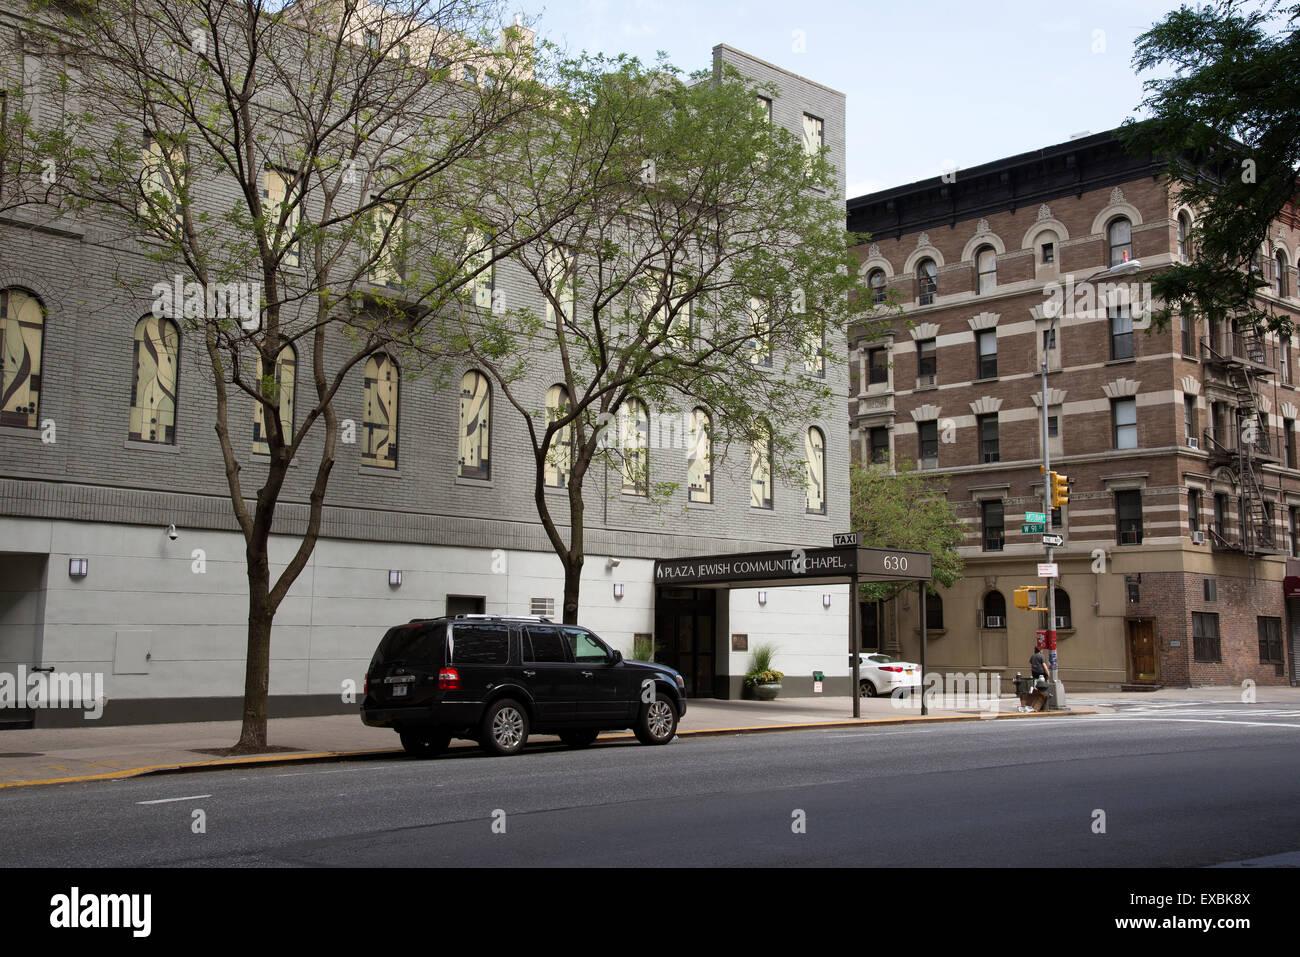 Plaza jewish Community Chapel on Amsterdam Avenue Manhattan NYC USA - Stock Image